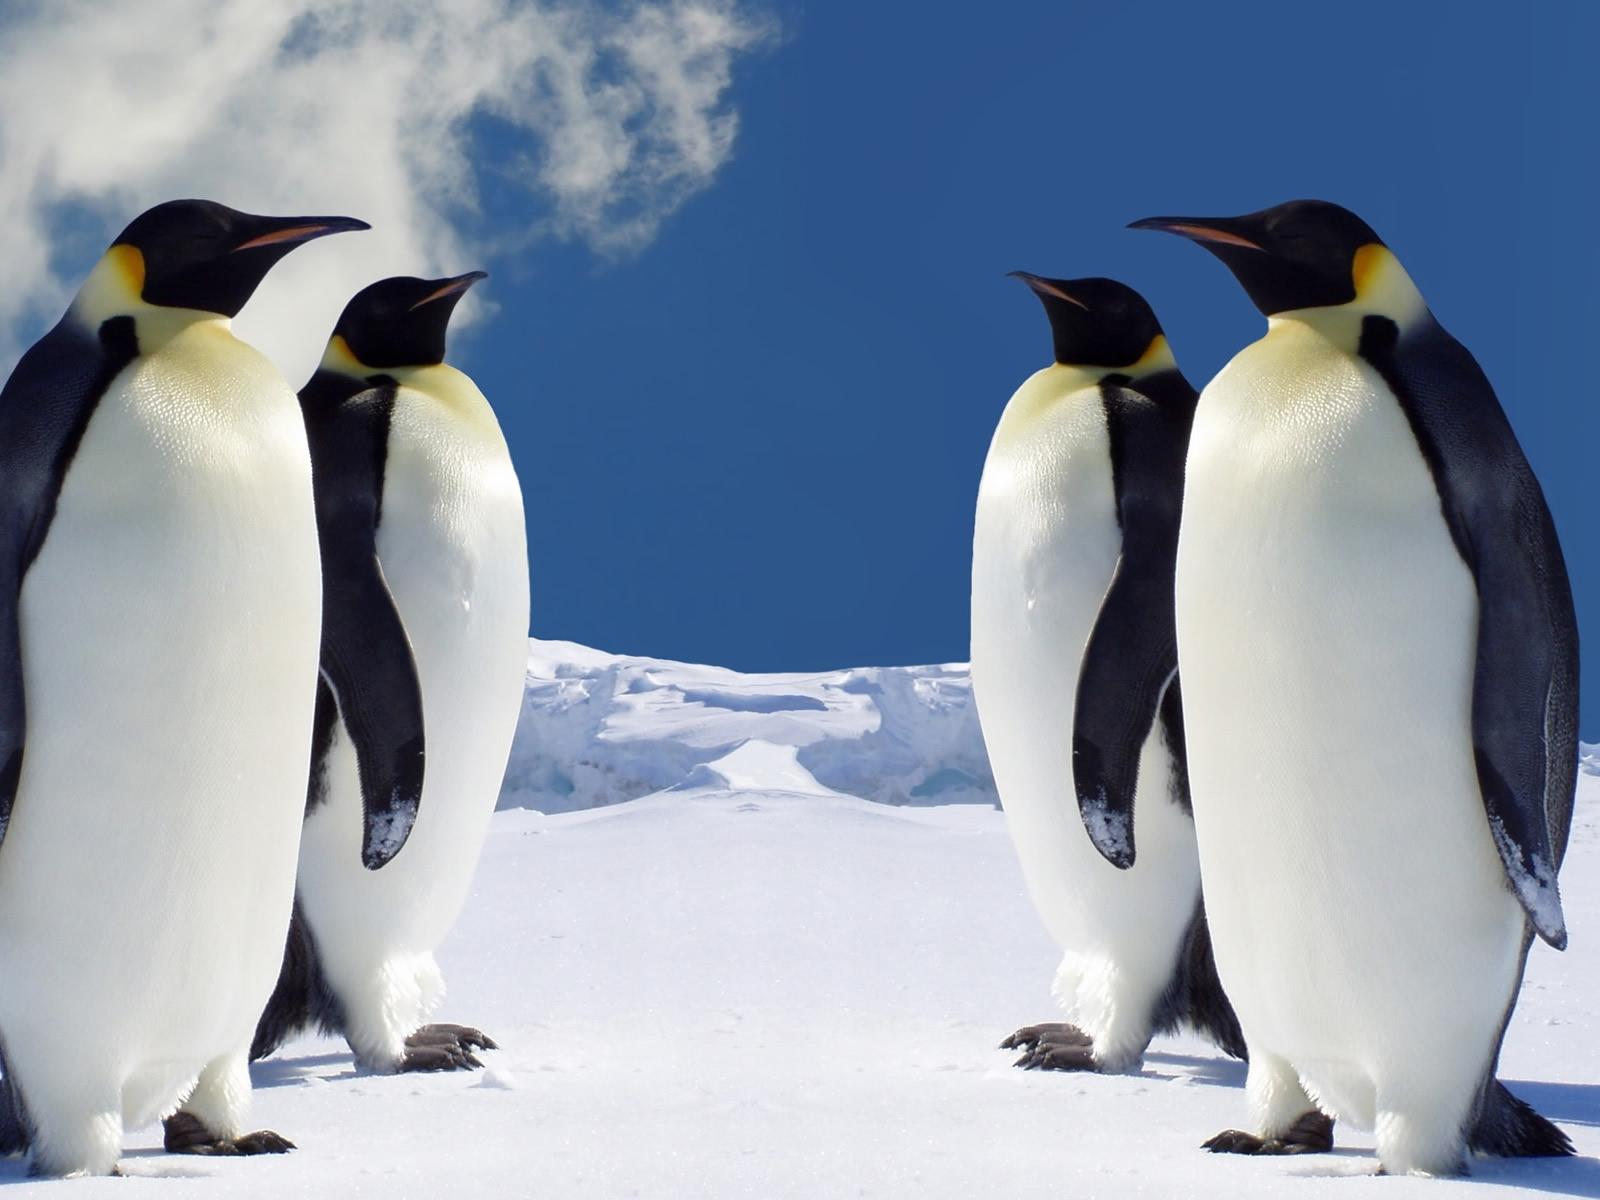 http://1.bp.blogspot.com/_sz2fJjO1XW8/TMgvroO1IwI/AAAAAAAAGxA/aBqY4bViCnc/s1600/hq-penguins-wallpaper-1600x1200-0906.jpg